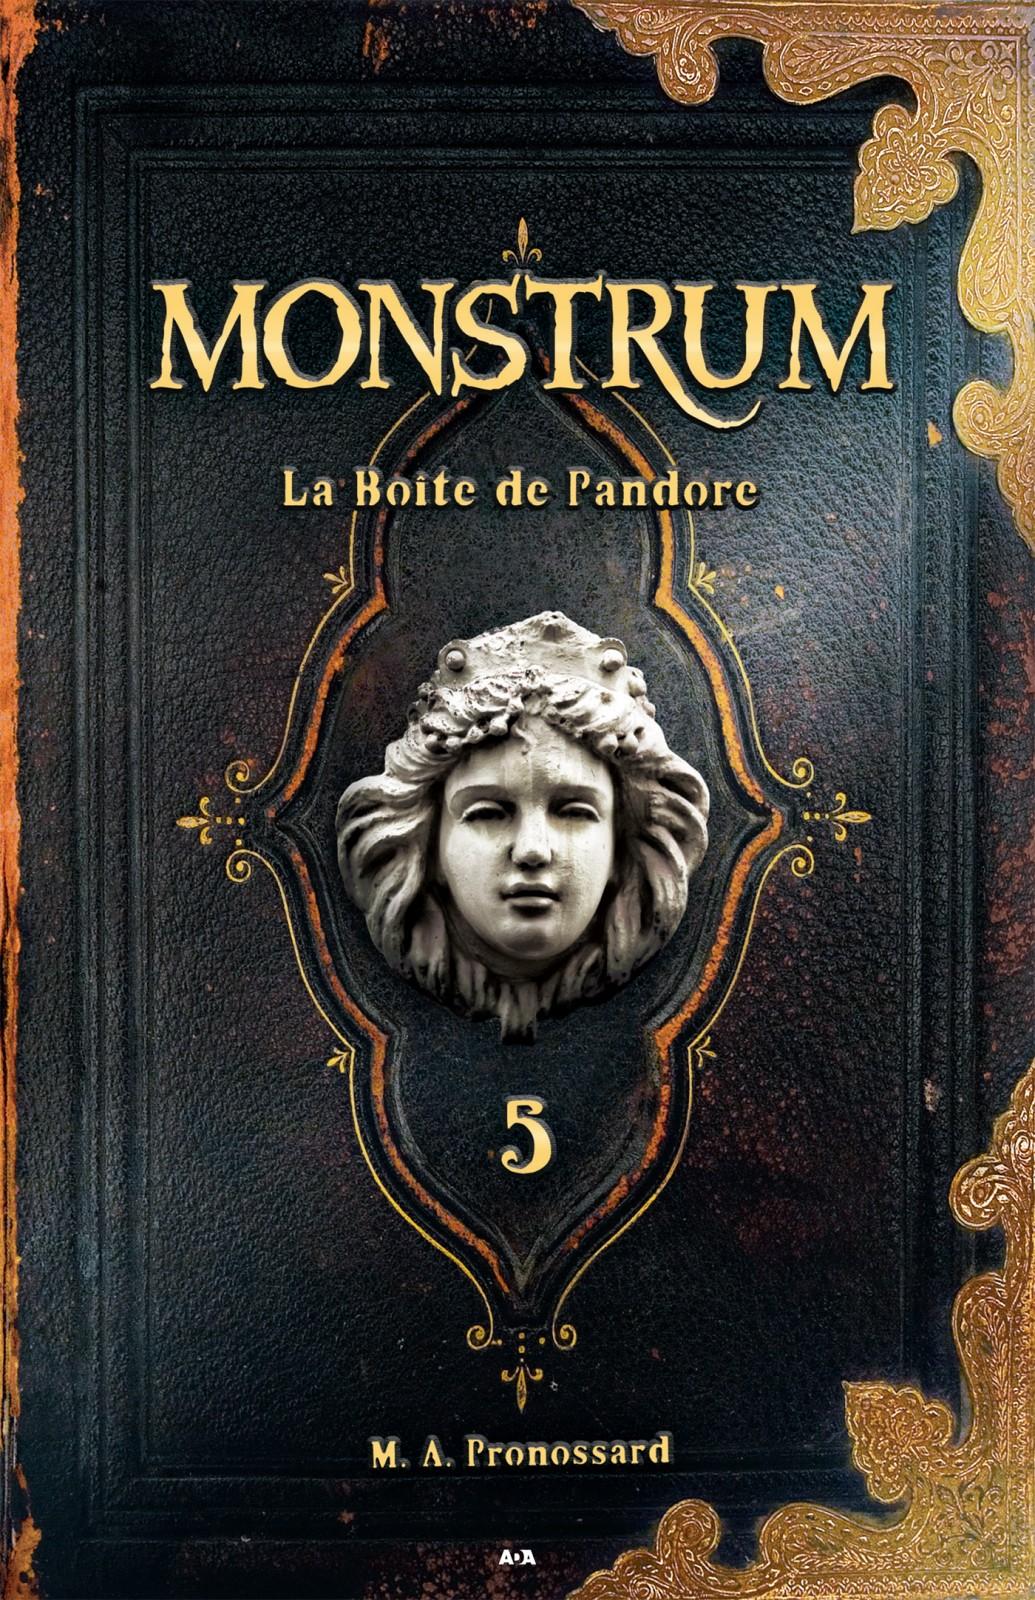 Monstrum, La boîte de Pandore